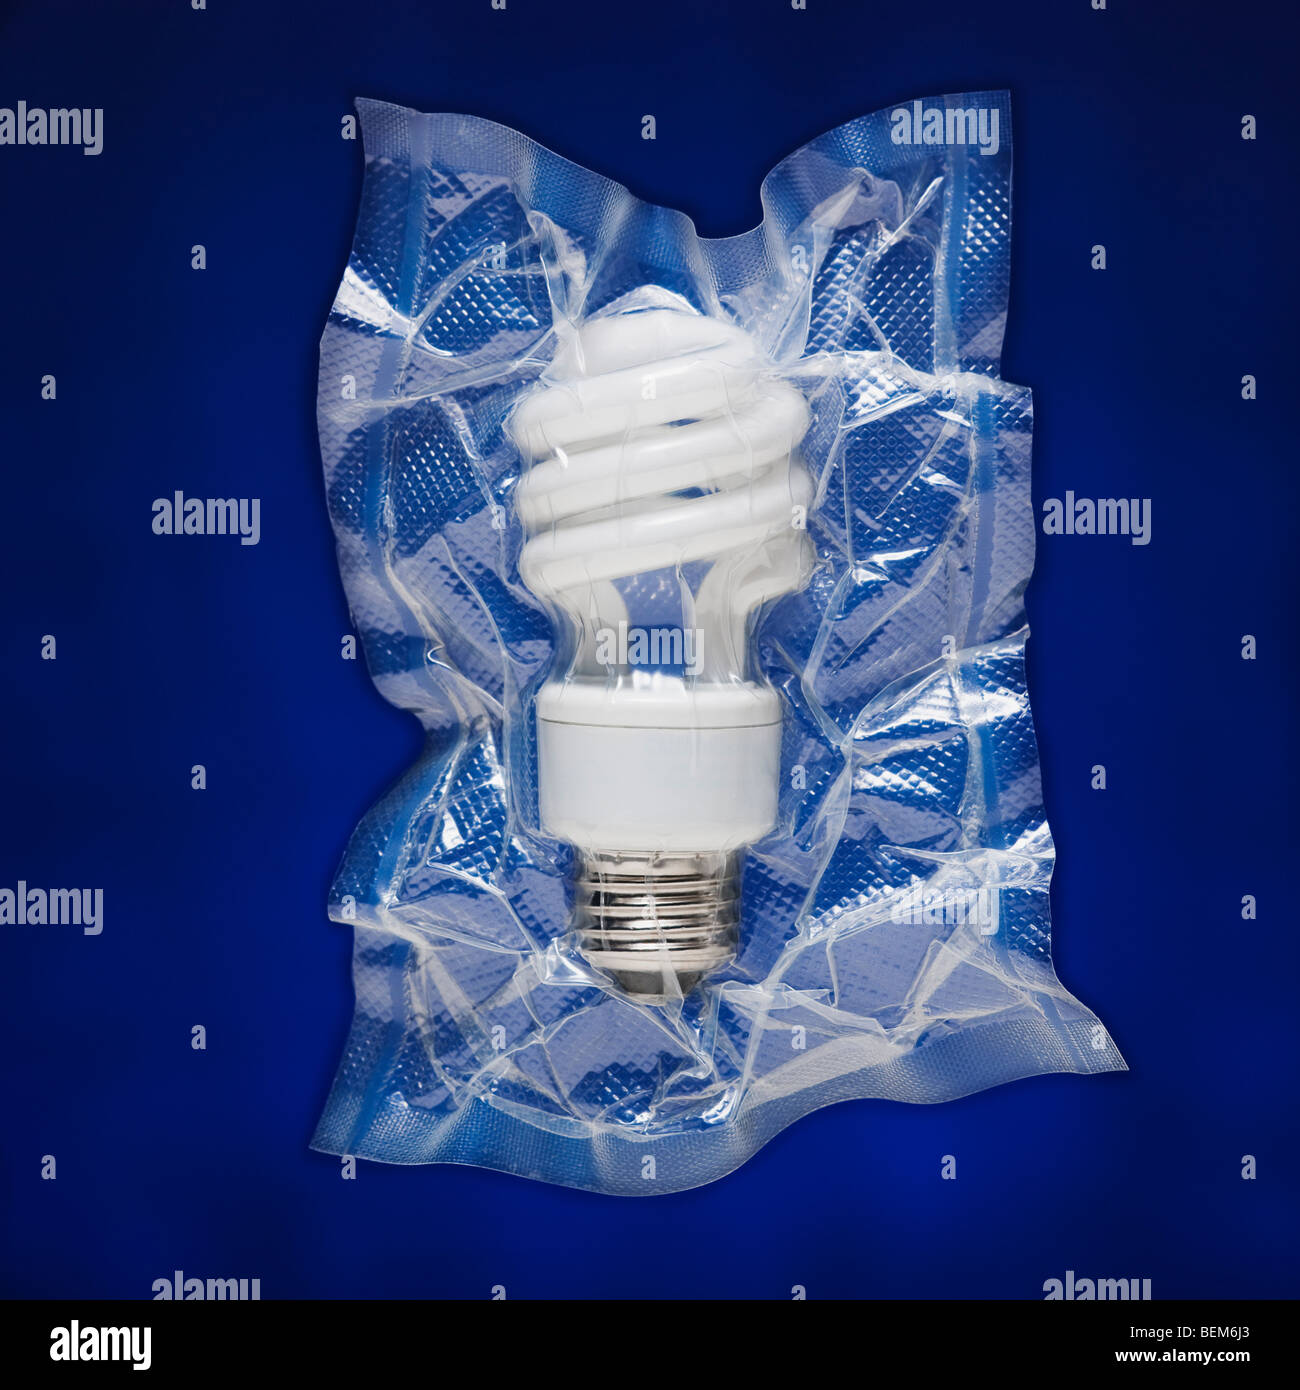 Shrink wrapped light bulb - Stock Image